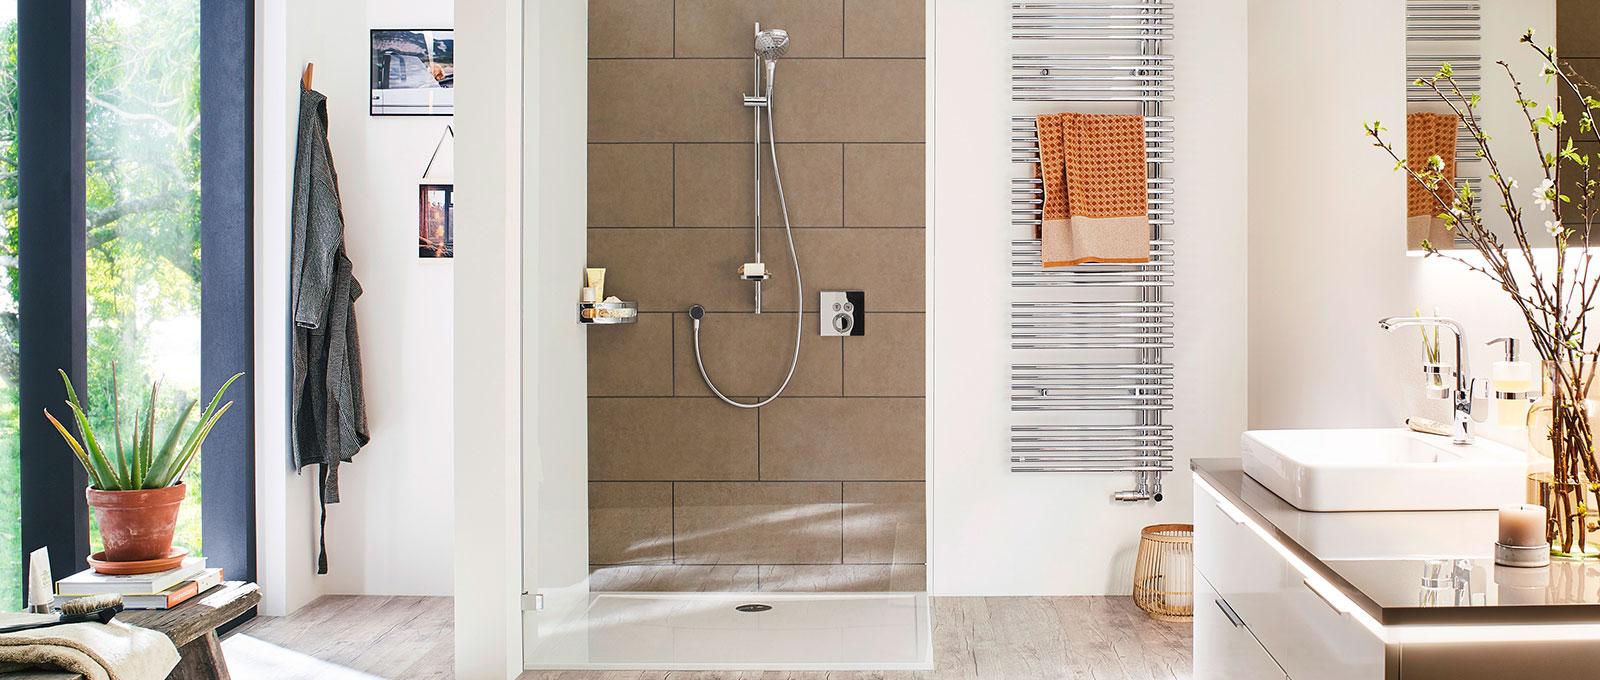 badausstellung armaturen badausstattung sanibel. Black Bedroom Furniture Sets. Home Design Ideas